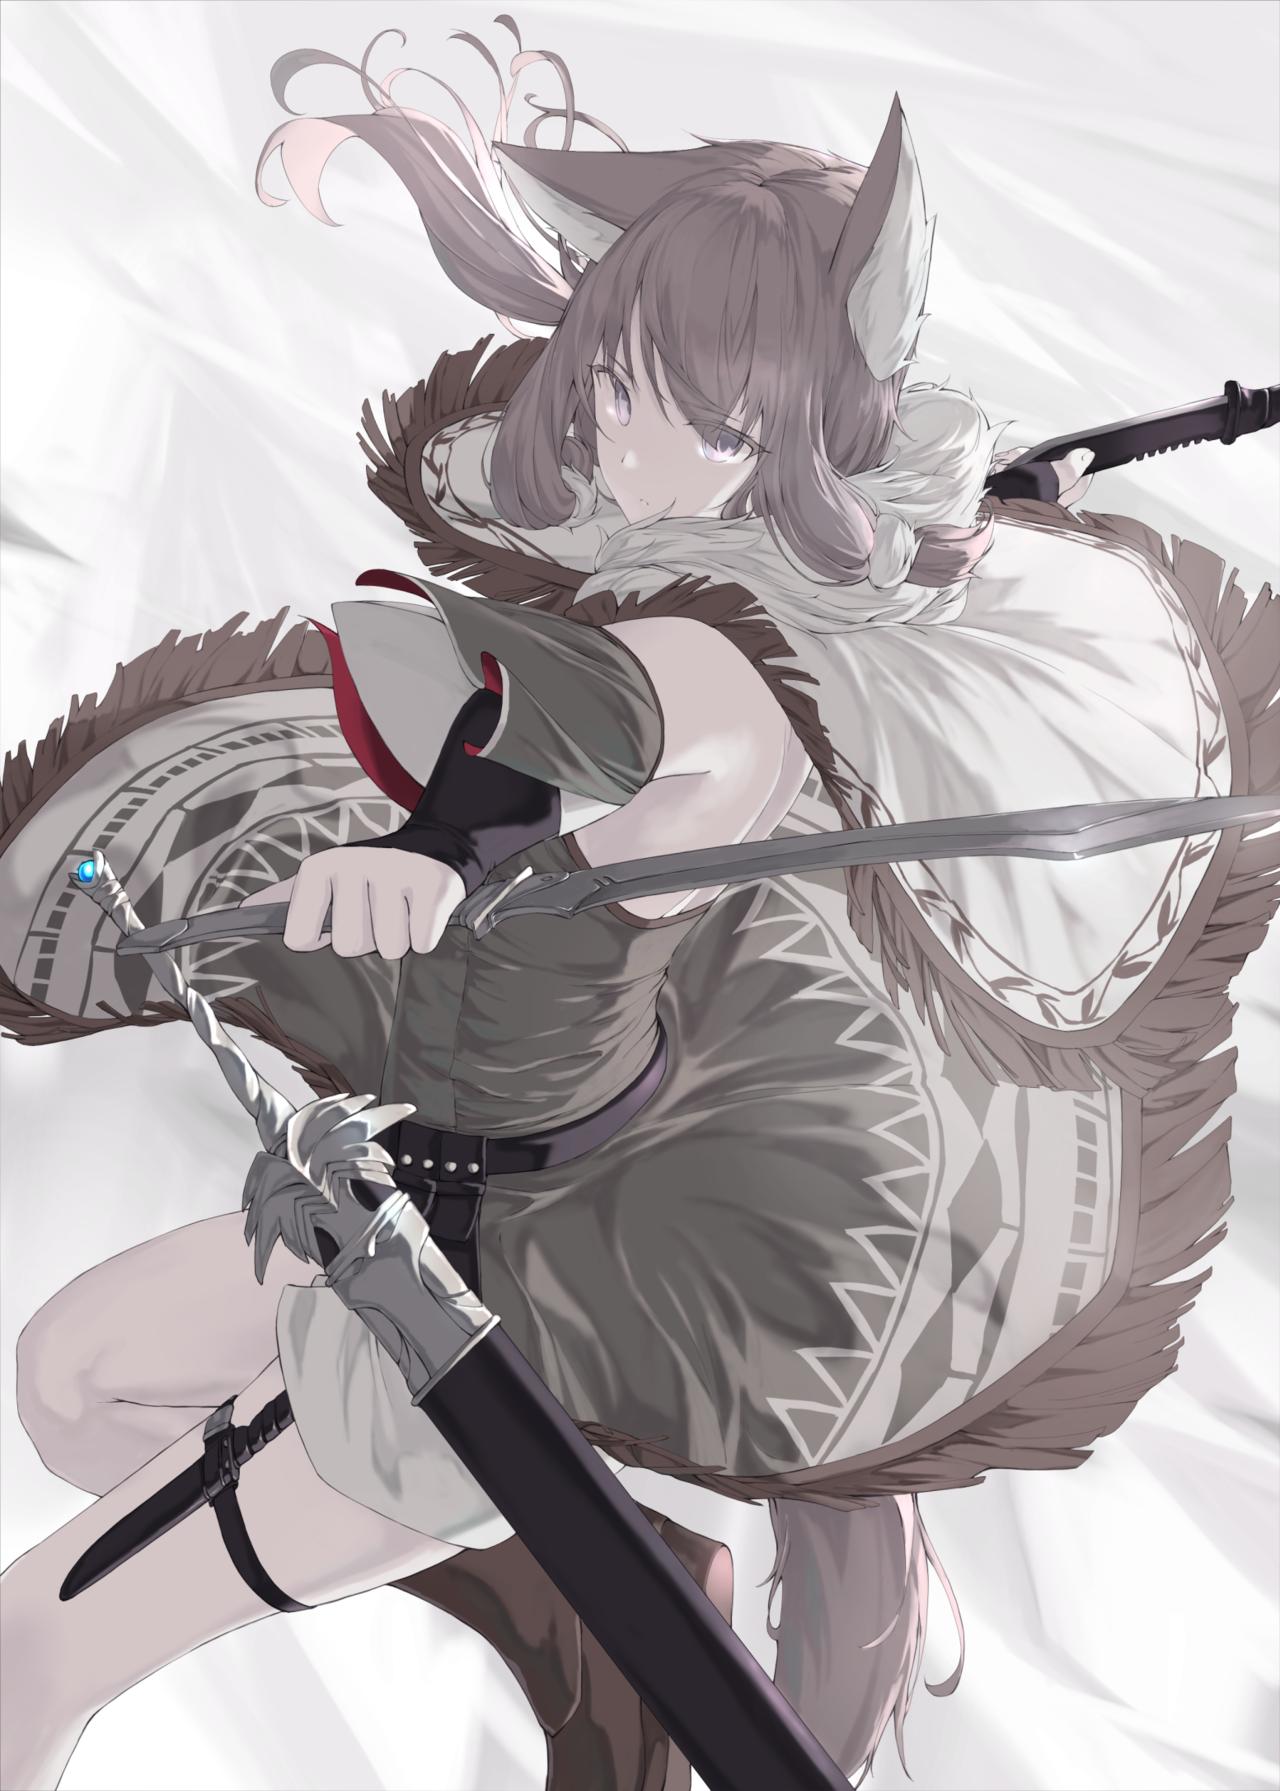 Millie  Anime wolf girl, Anime warrior, Anime art girl